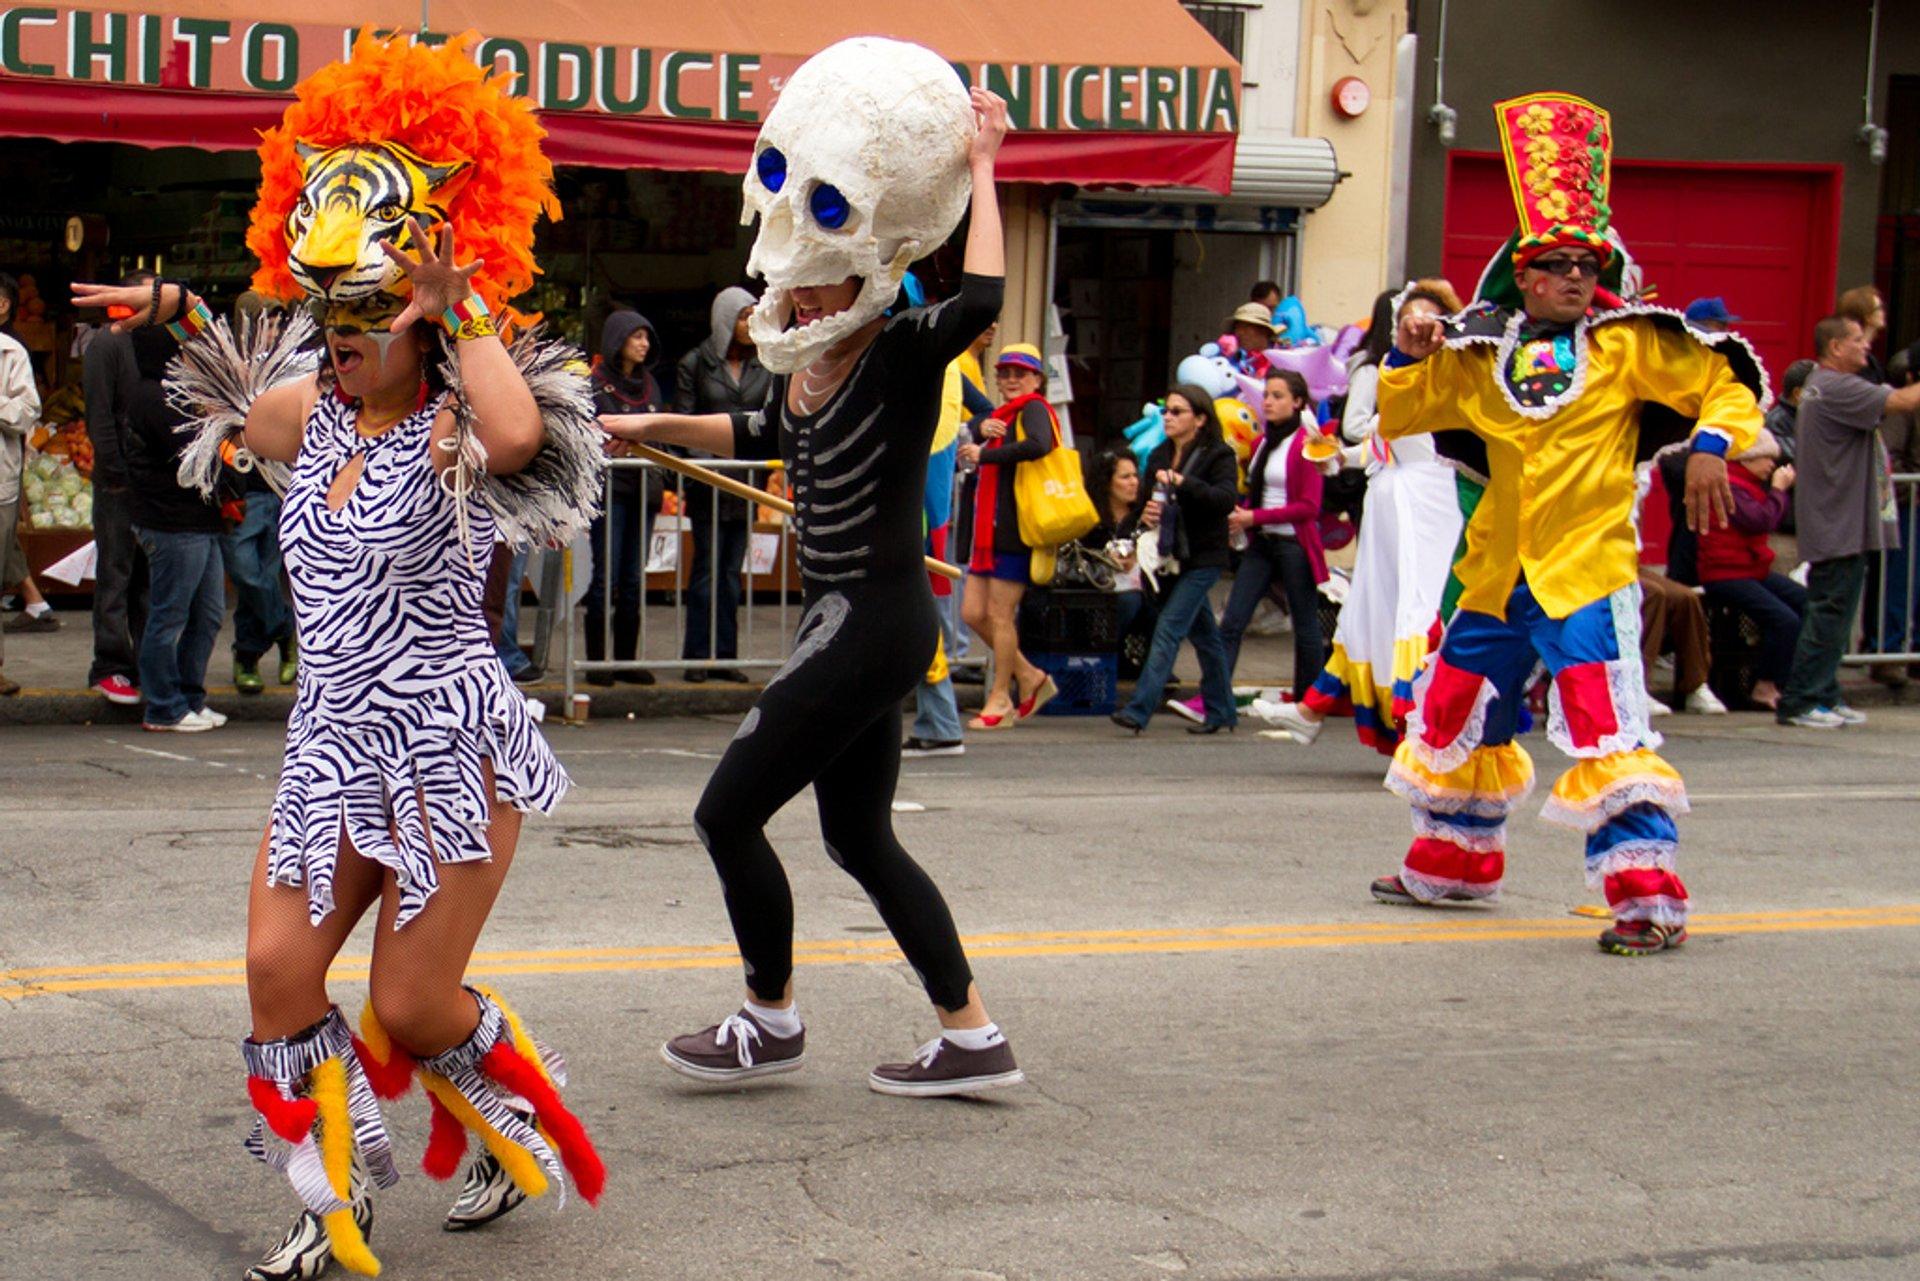 Carnaval in San Francisco - Best Season 2019